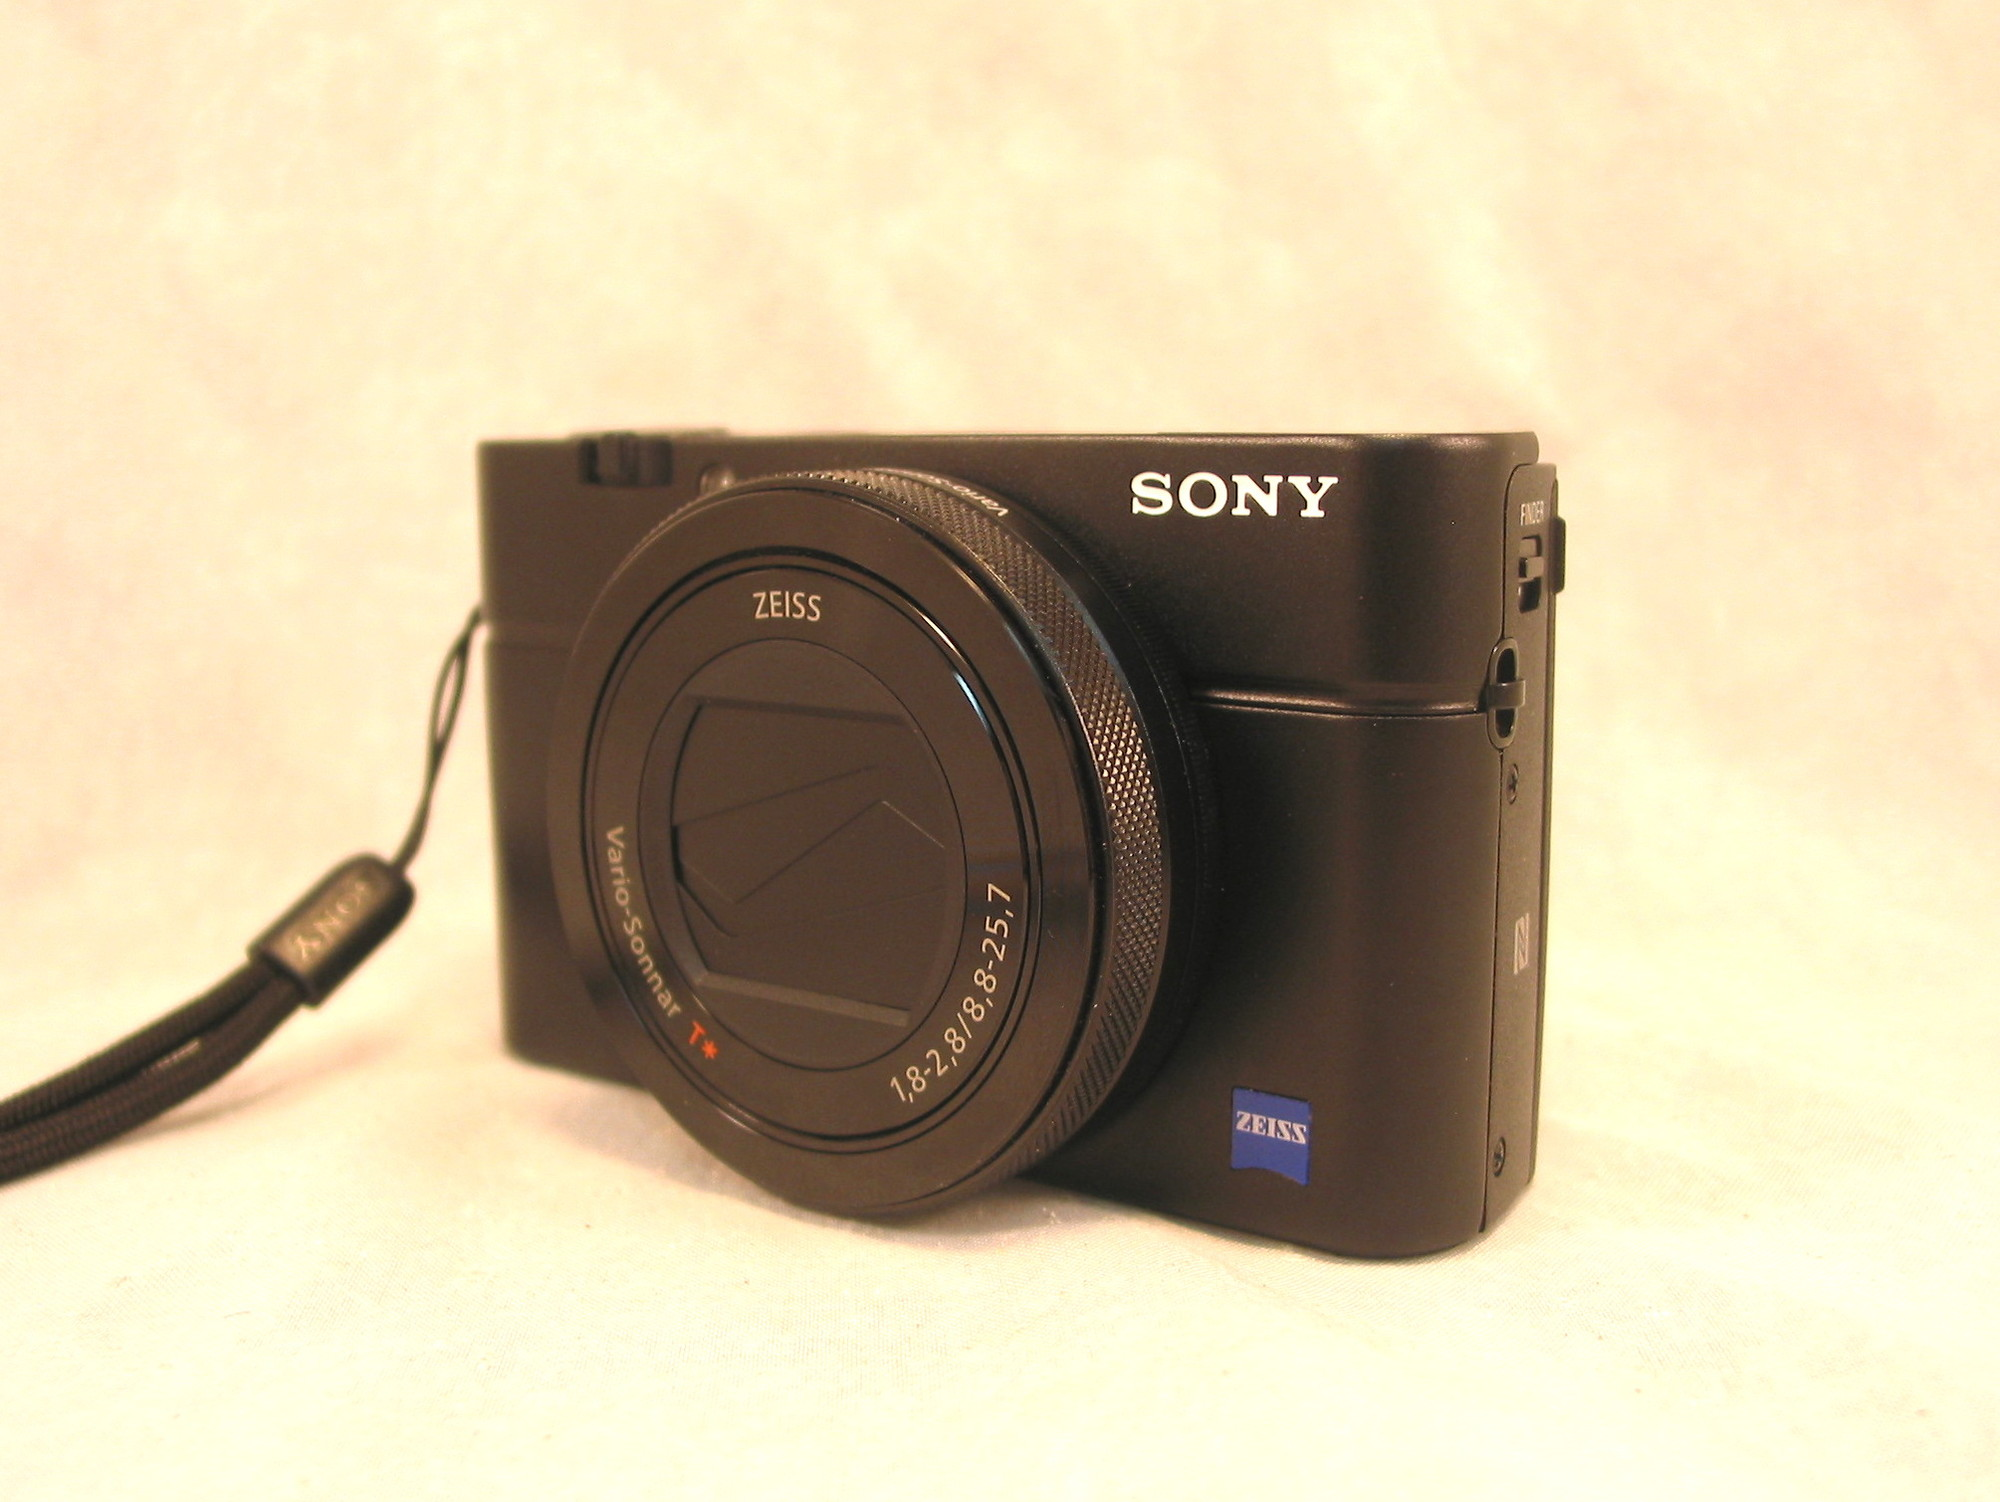 Sold: SONY RX100 IV DIGITAL POINT & SHOOT CYBER-SHOT CAMERA